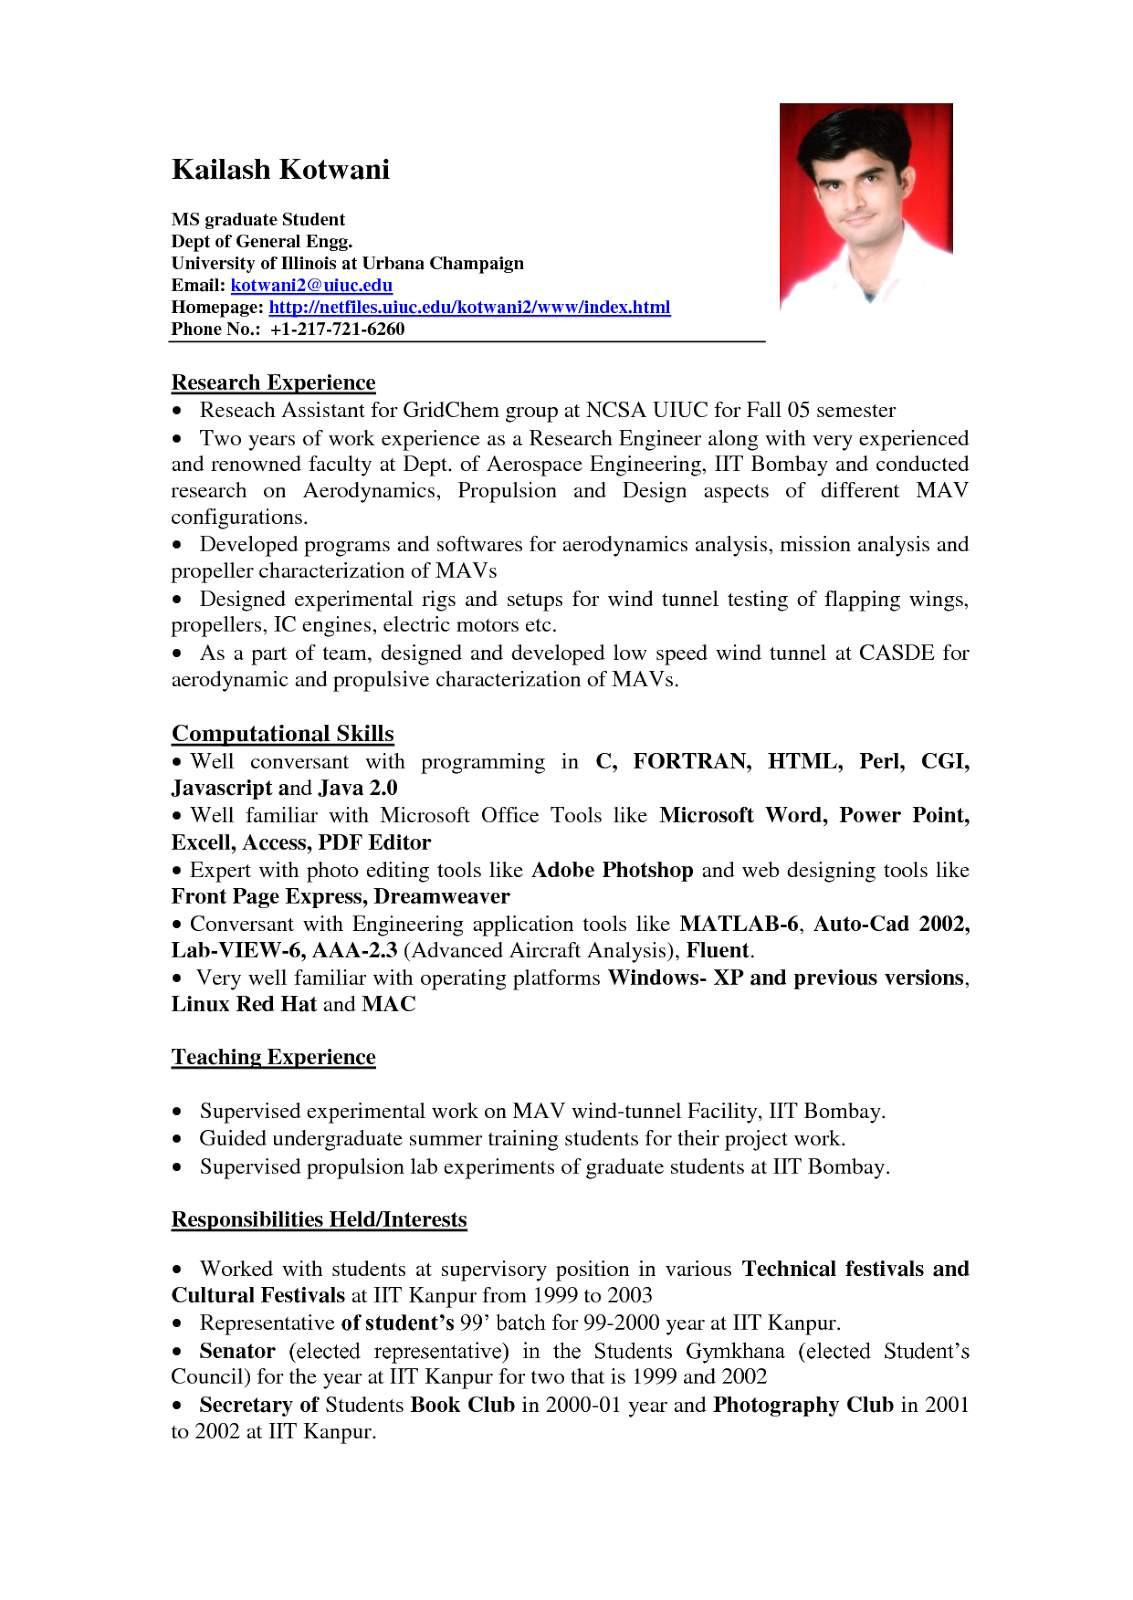 sample resume for fresh graduateml